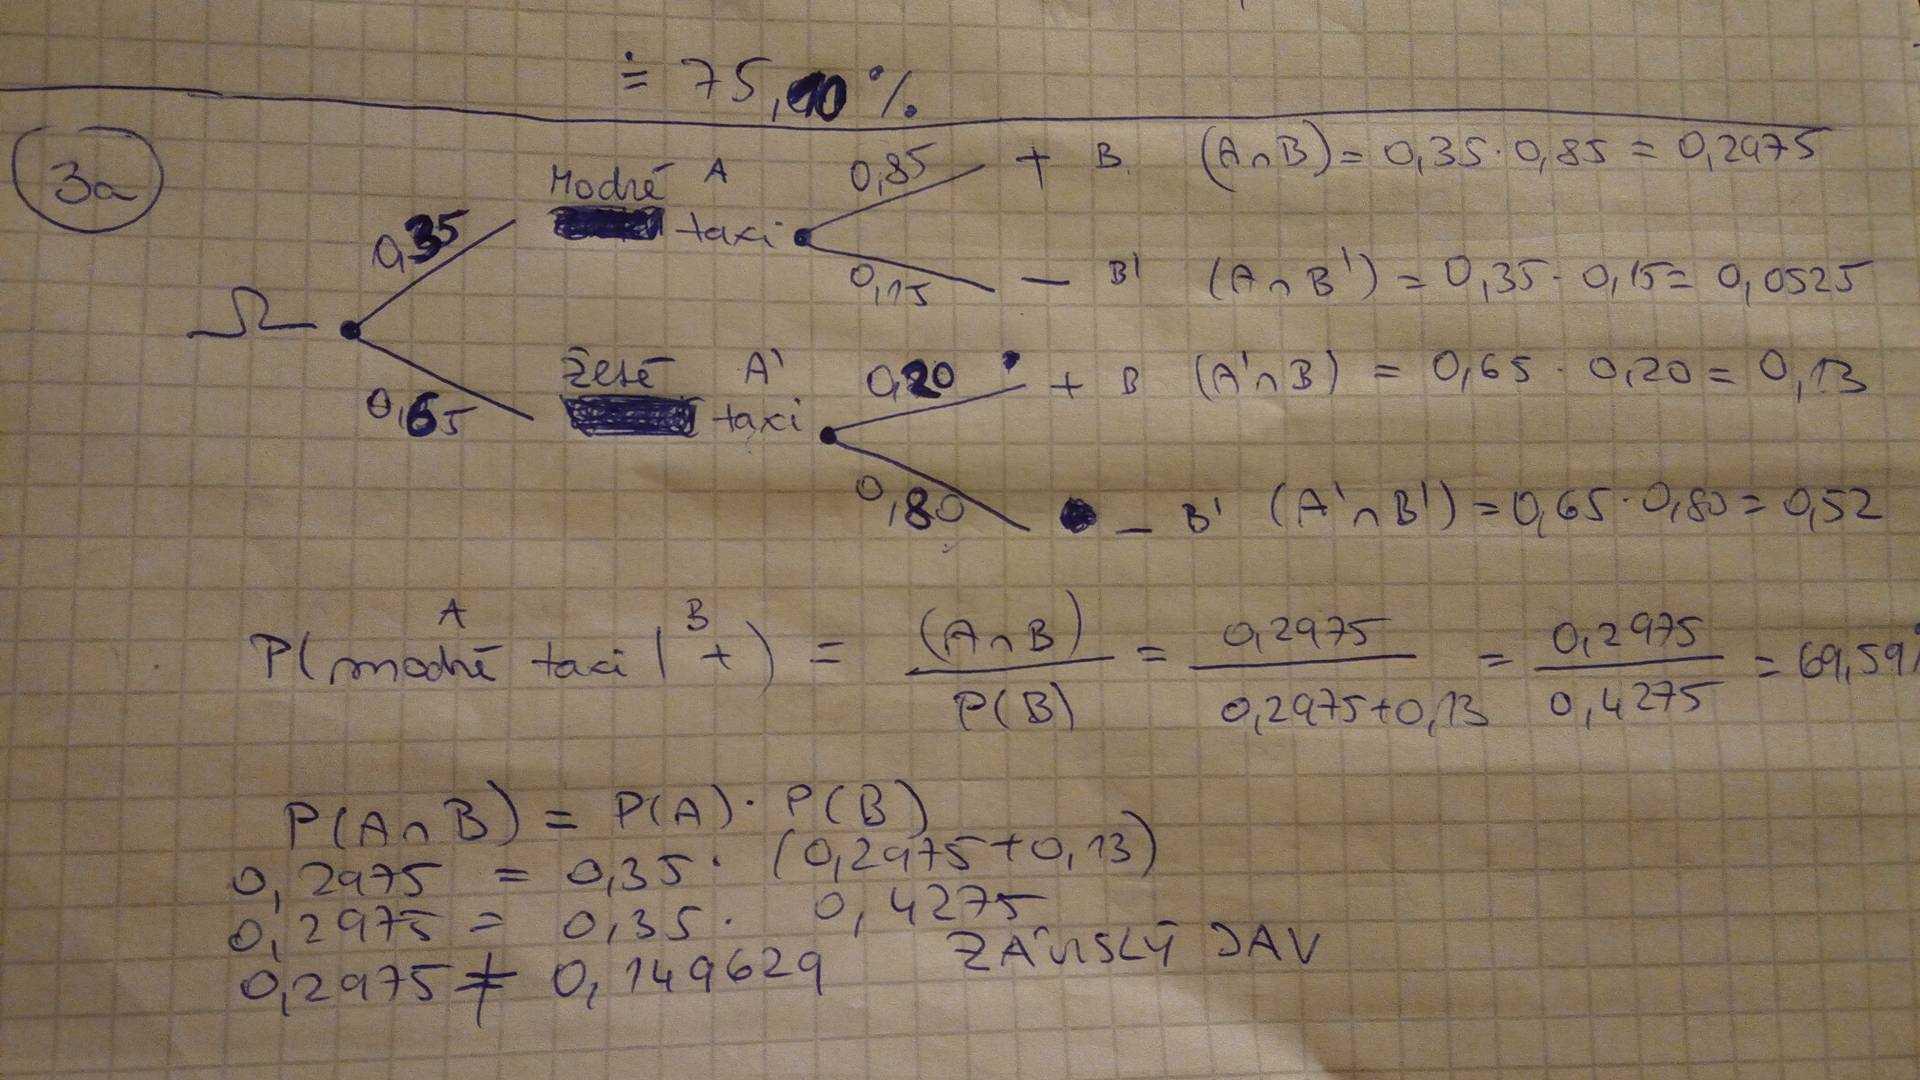 http://forum.matematika.cz/upload3/img/2017-11/24367_23730997_10210082751896086_745215177_o.jpg